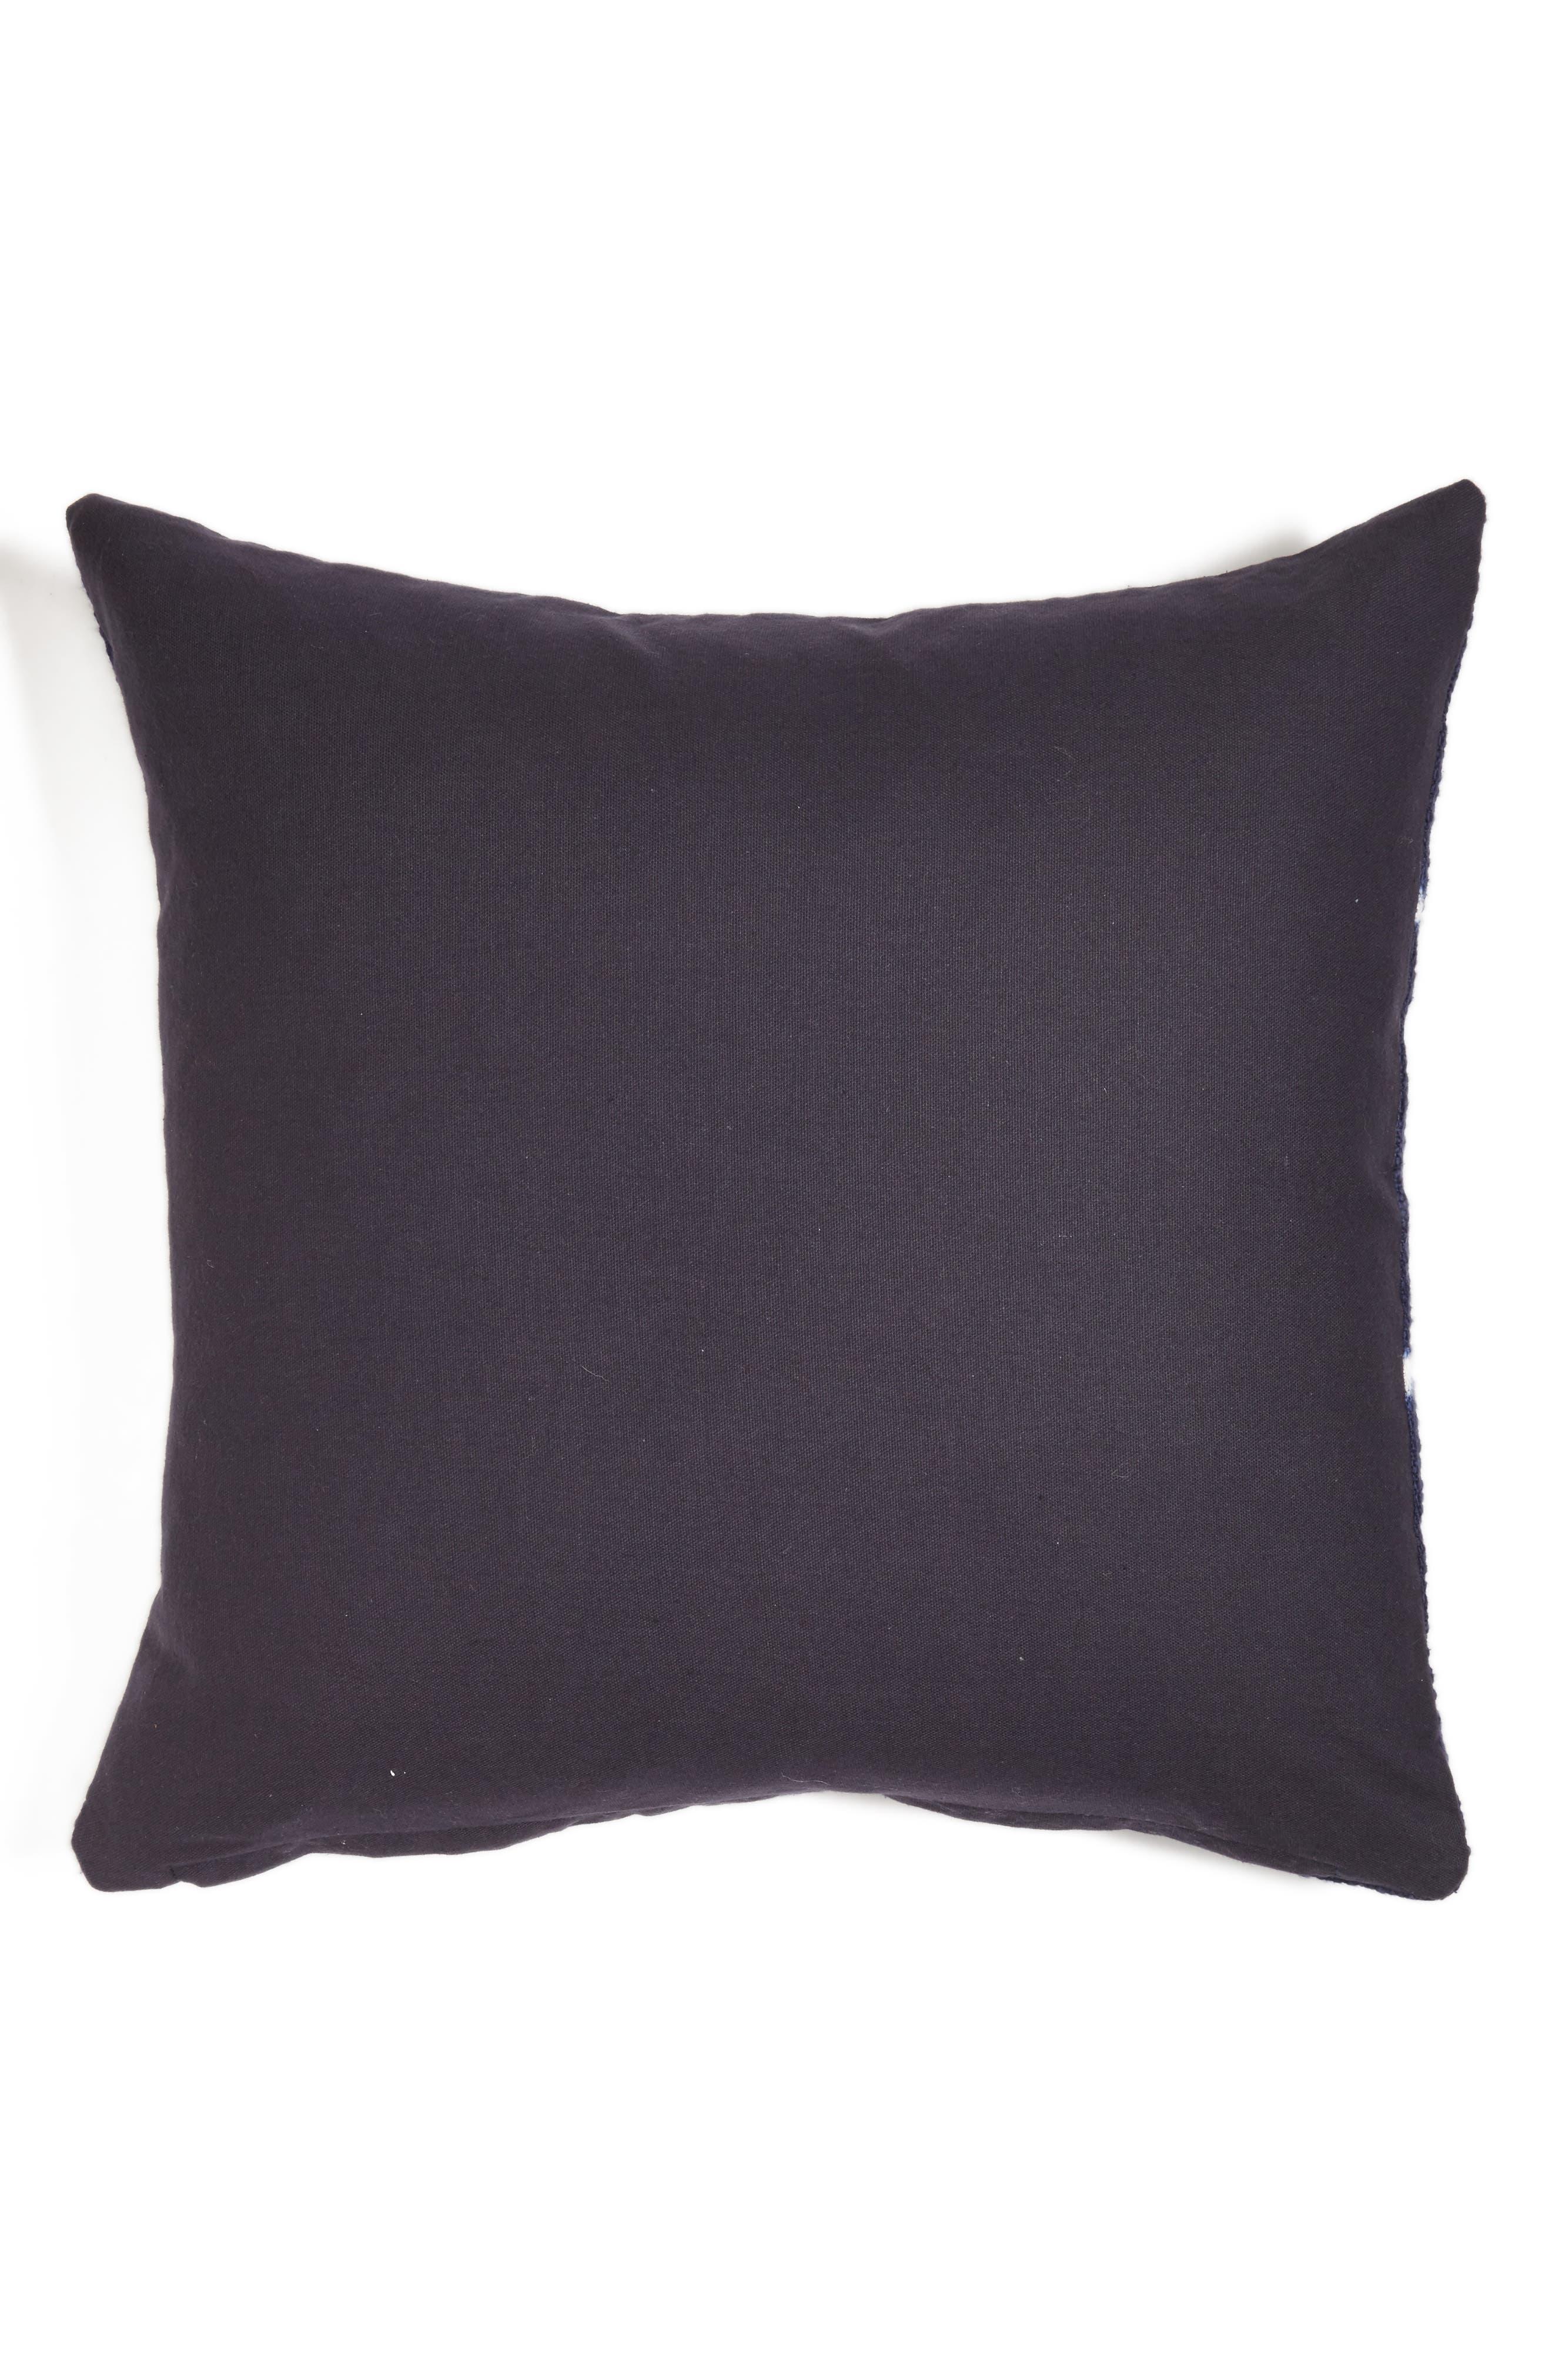 Medieval Blue Accent Pillow,                             Alternate thumbnail 2, color,                             400